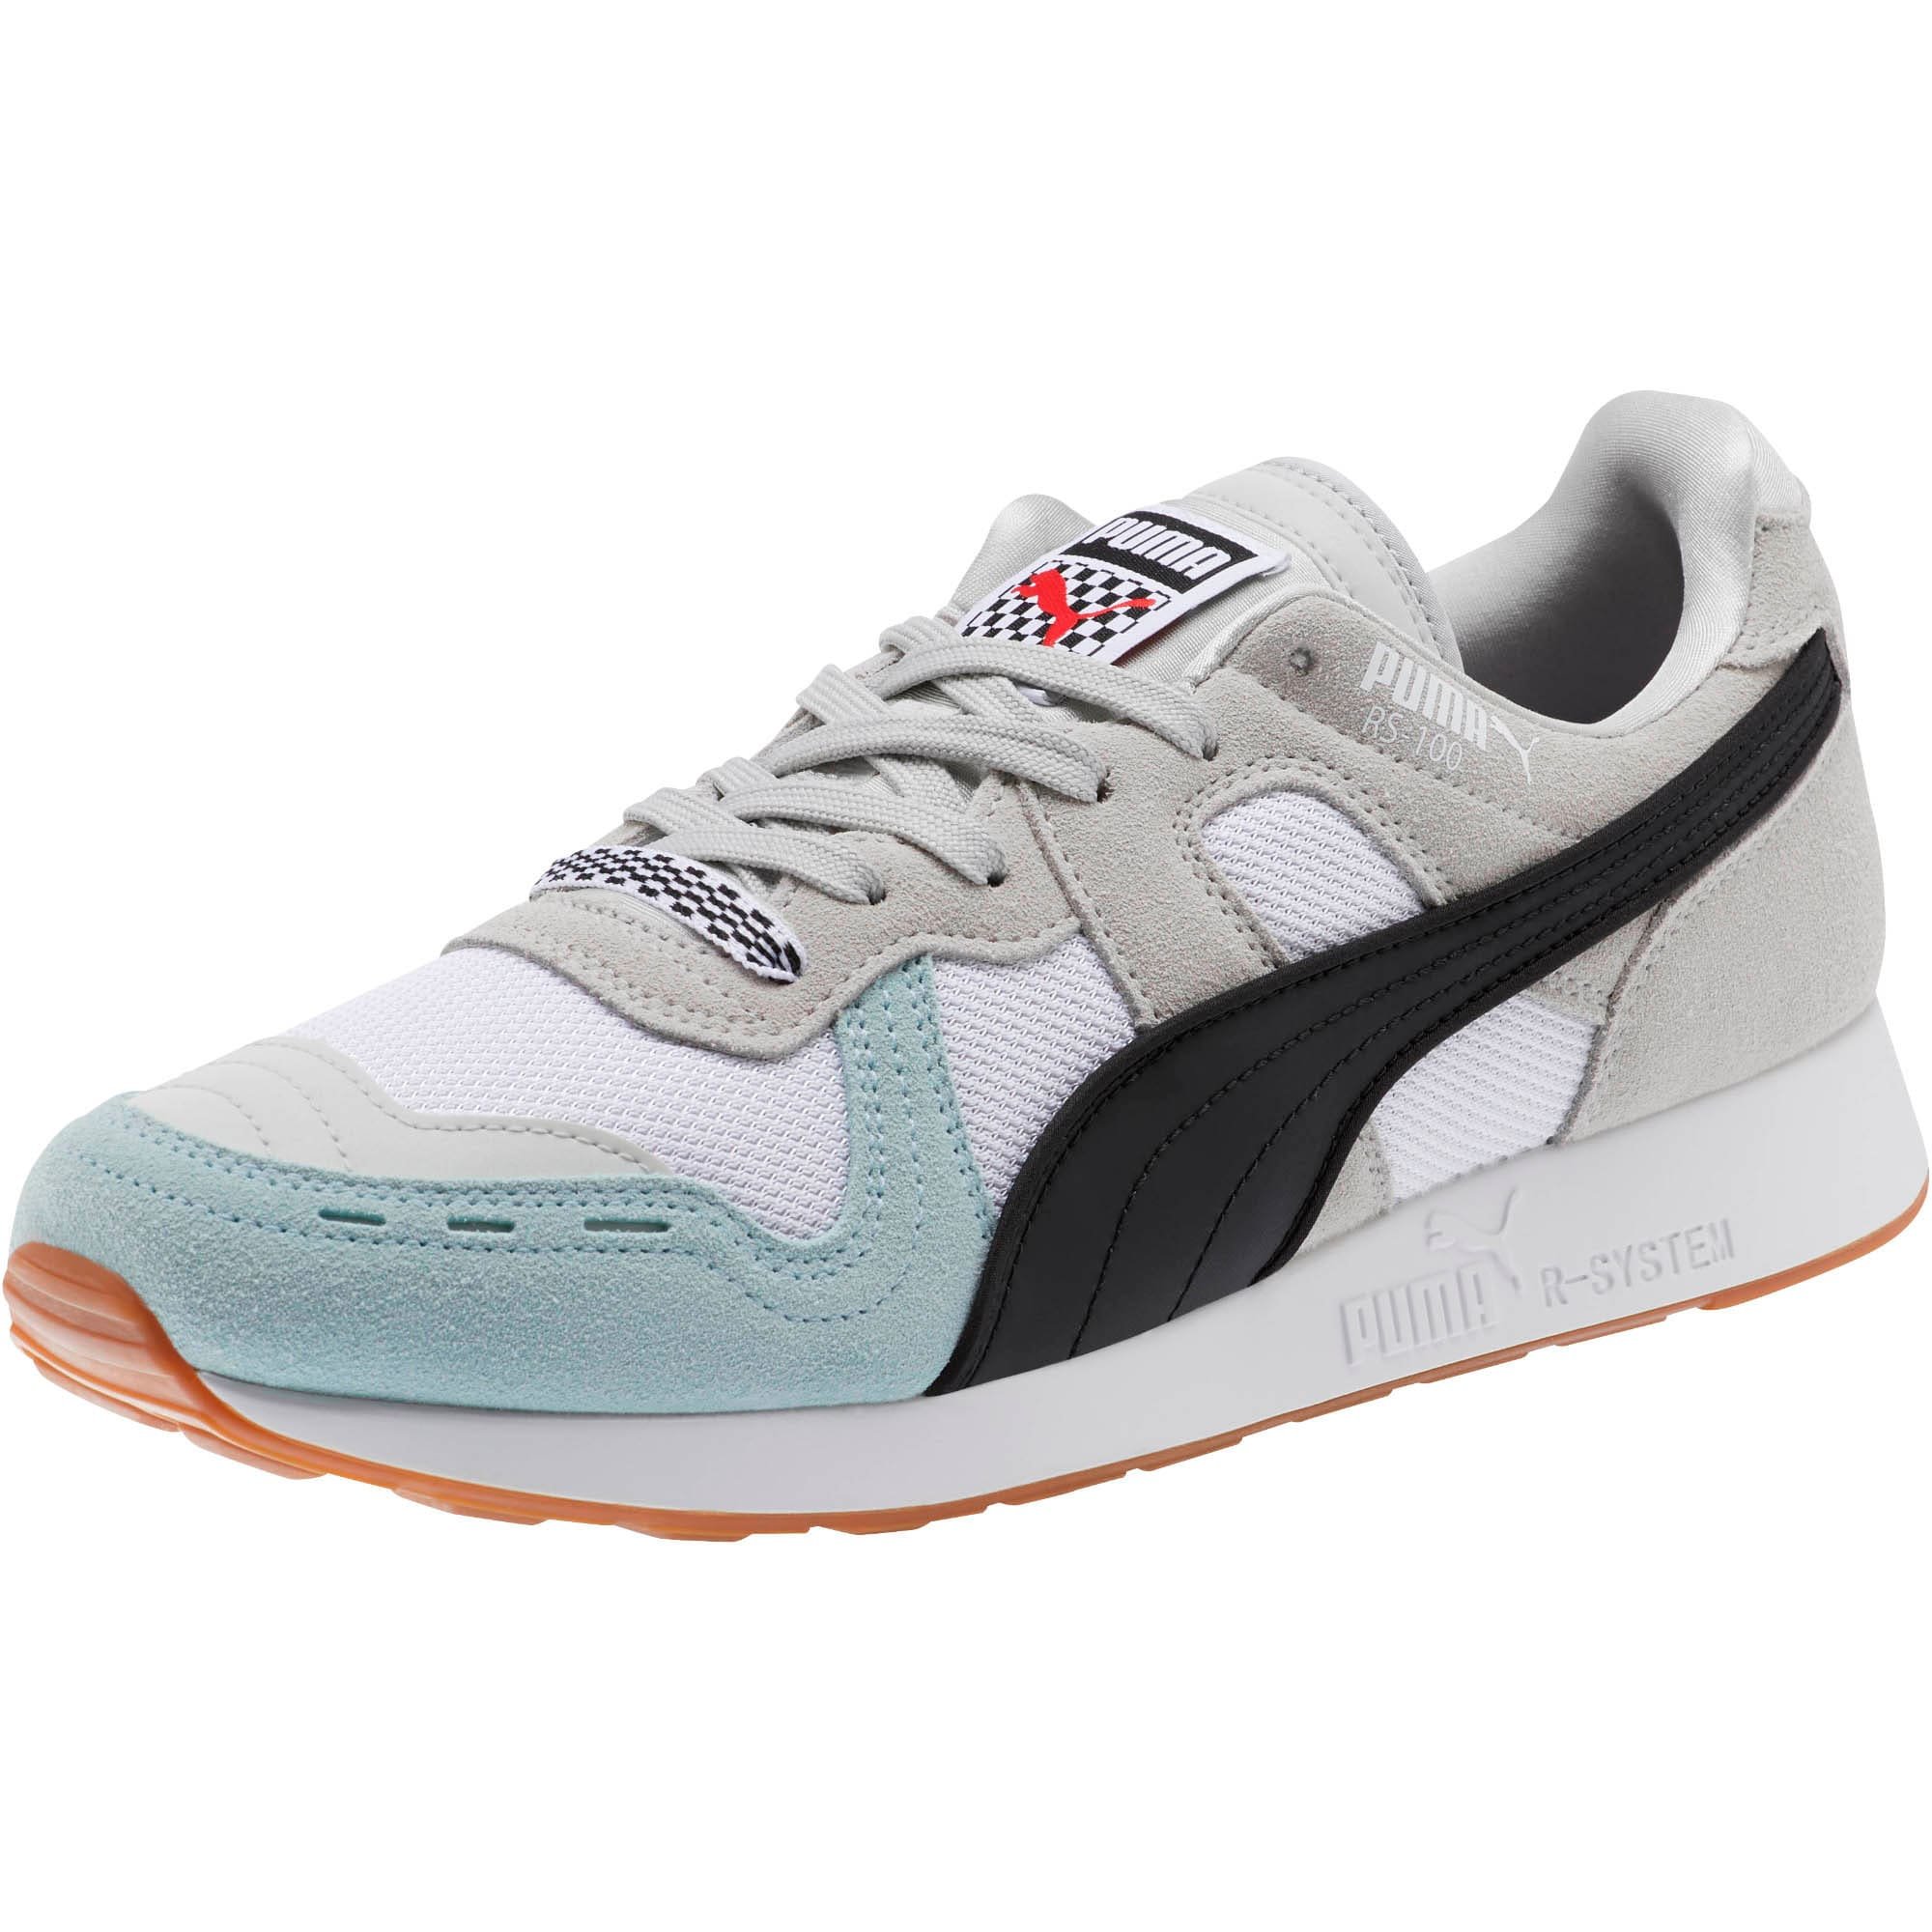 Miniatura 1 de Zapatos deportivos RS-100 Racing Flag, Glacier Gray-Puma White, mediano